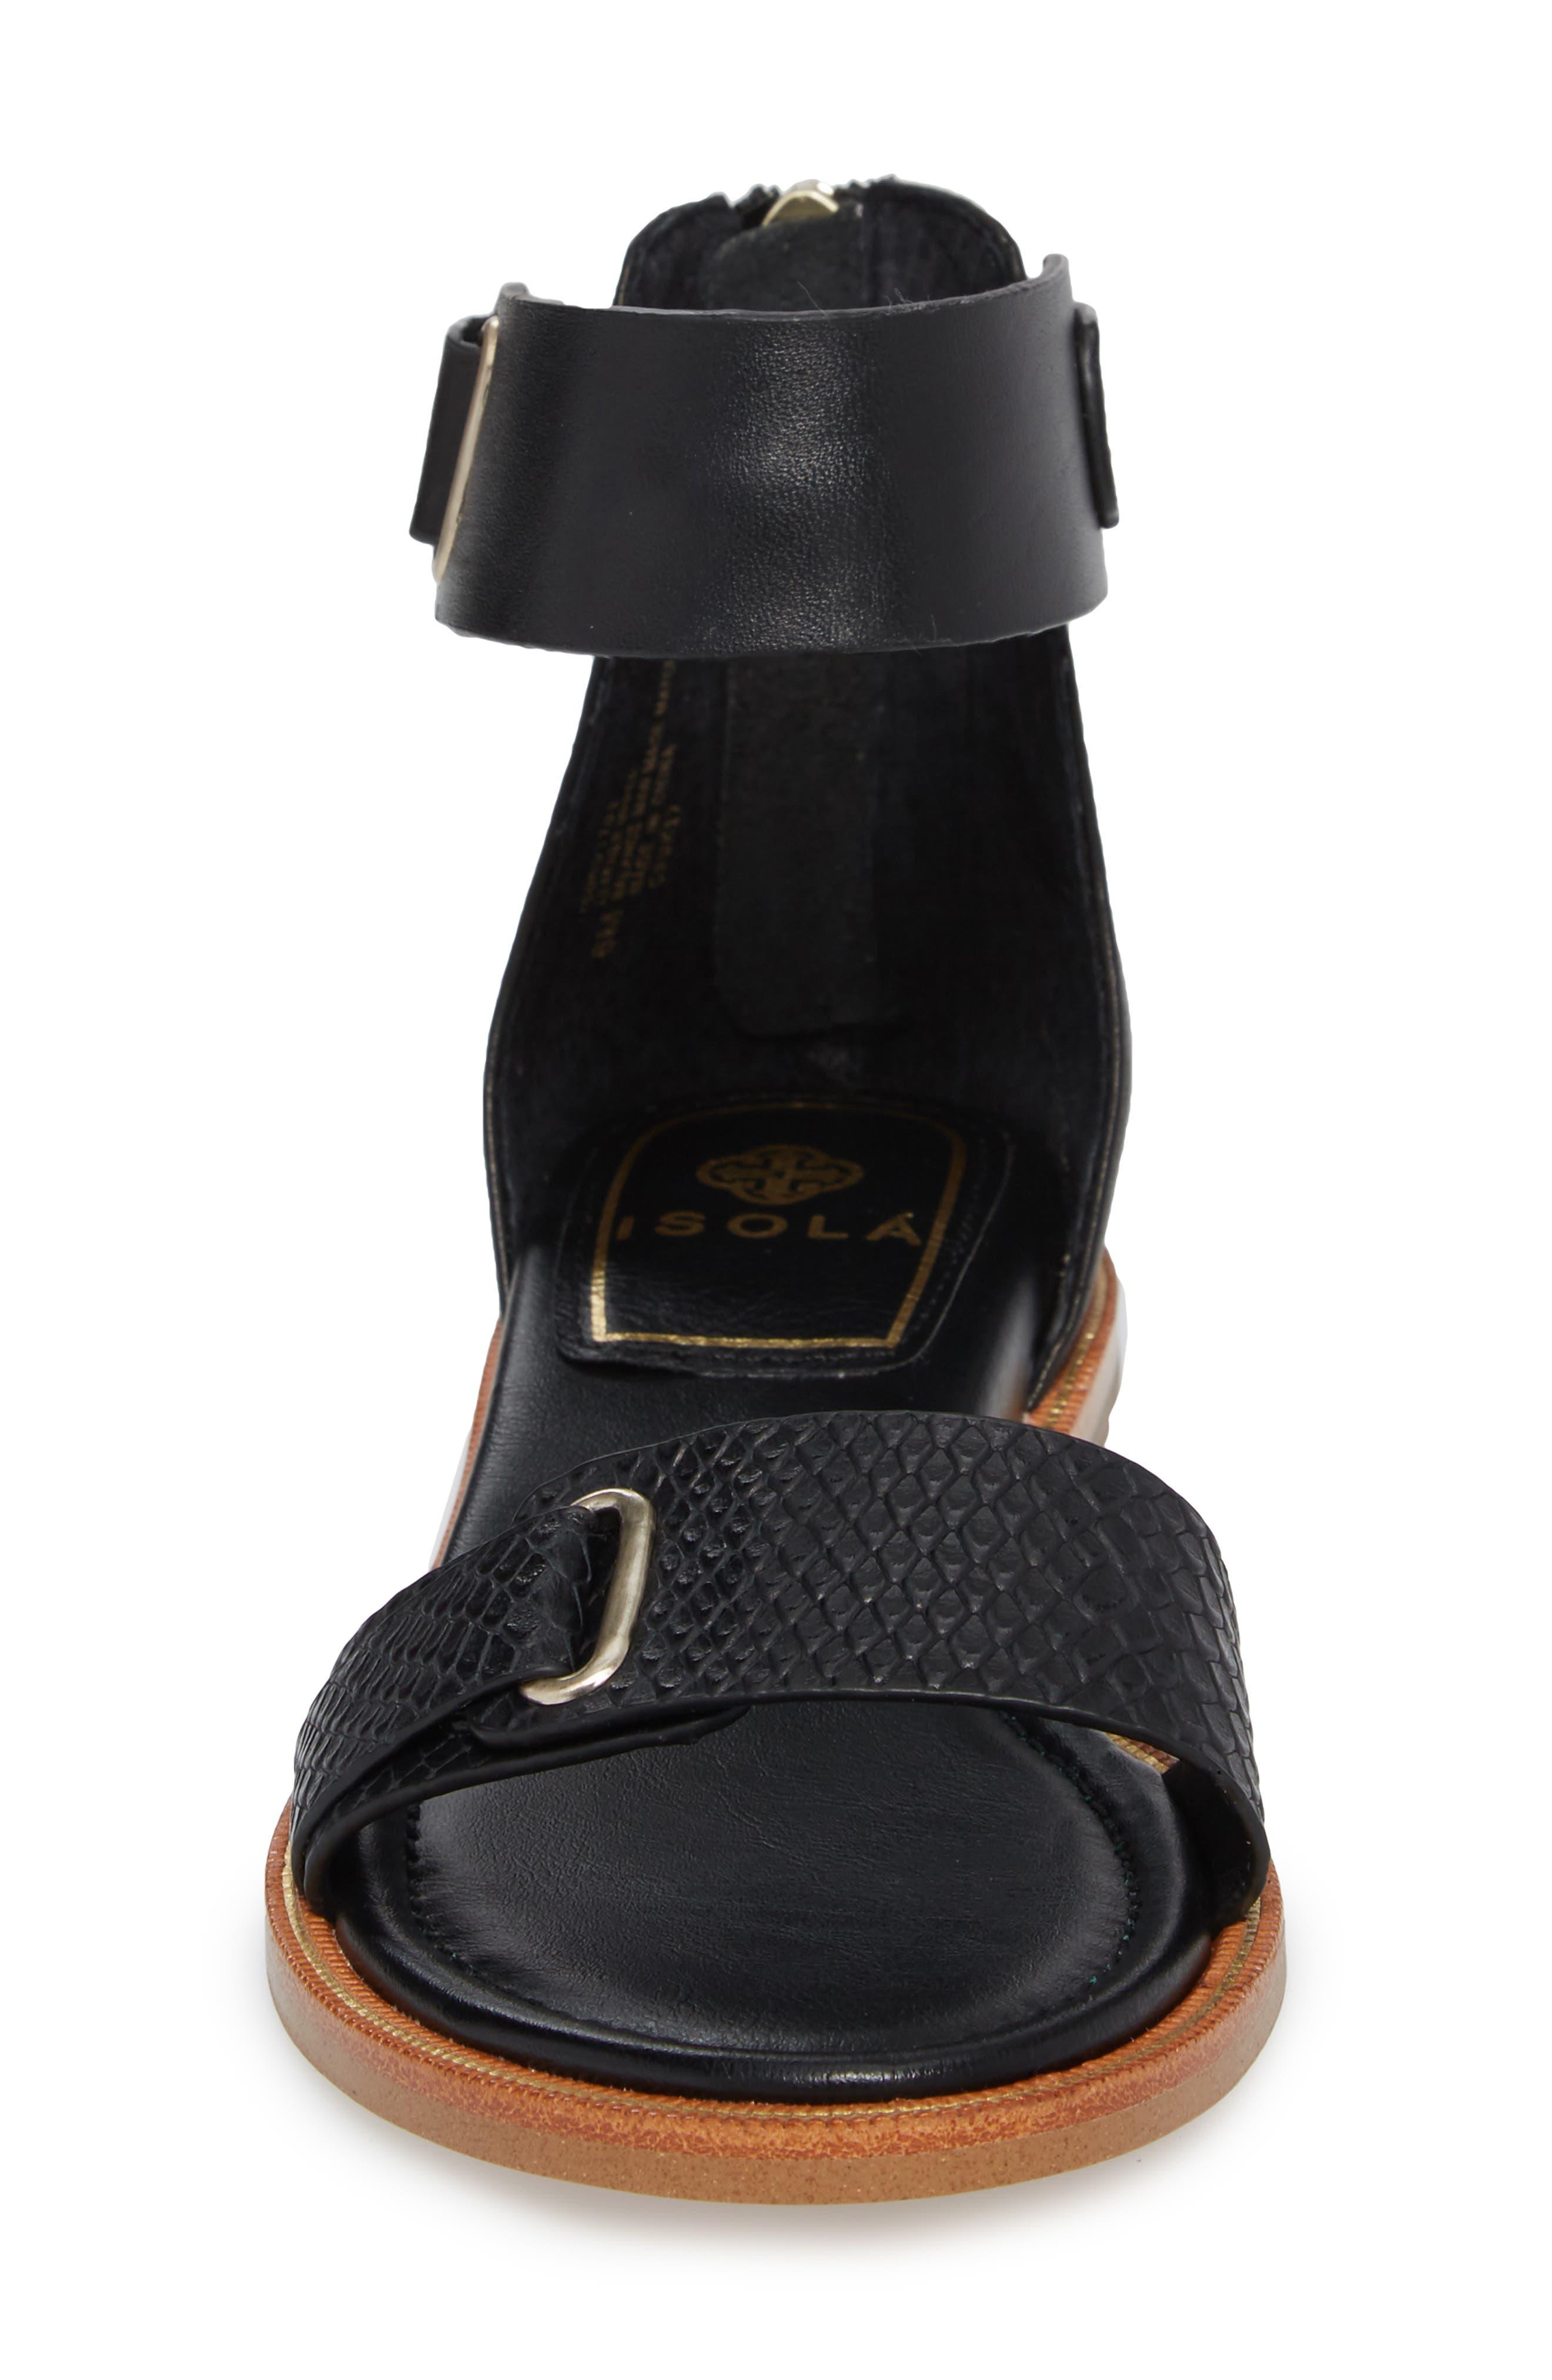 ISOLÁ, Savina Ankle Strap Sandal, Alternate thumbnail 4, color, BLACK LEATHER